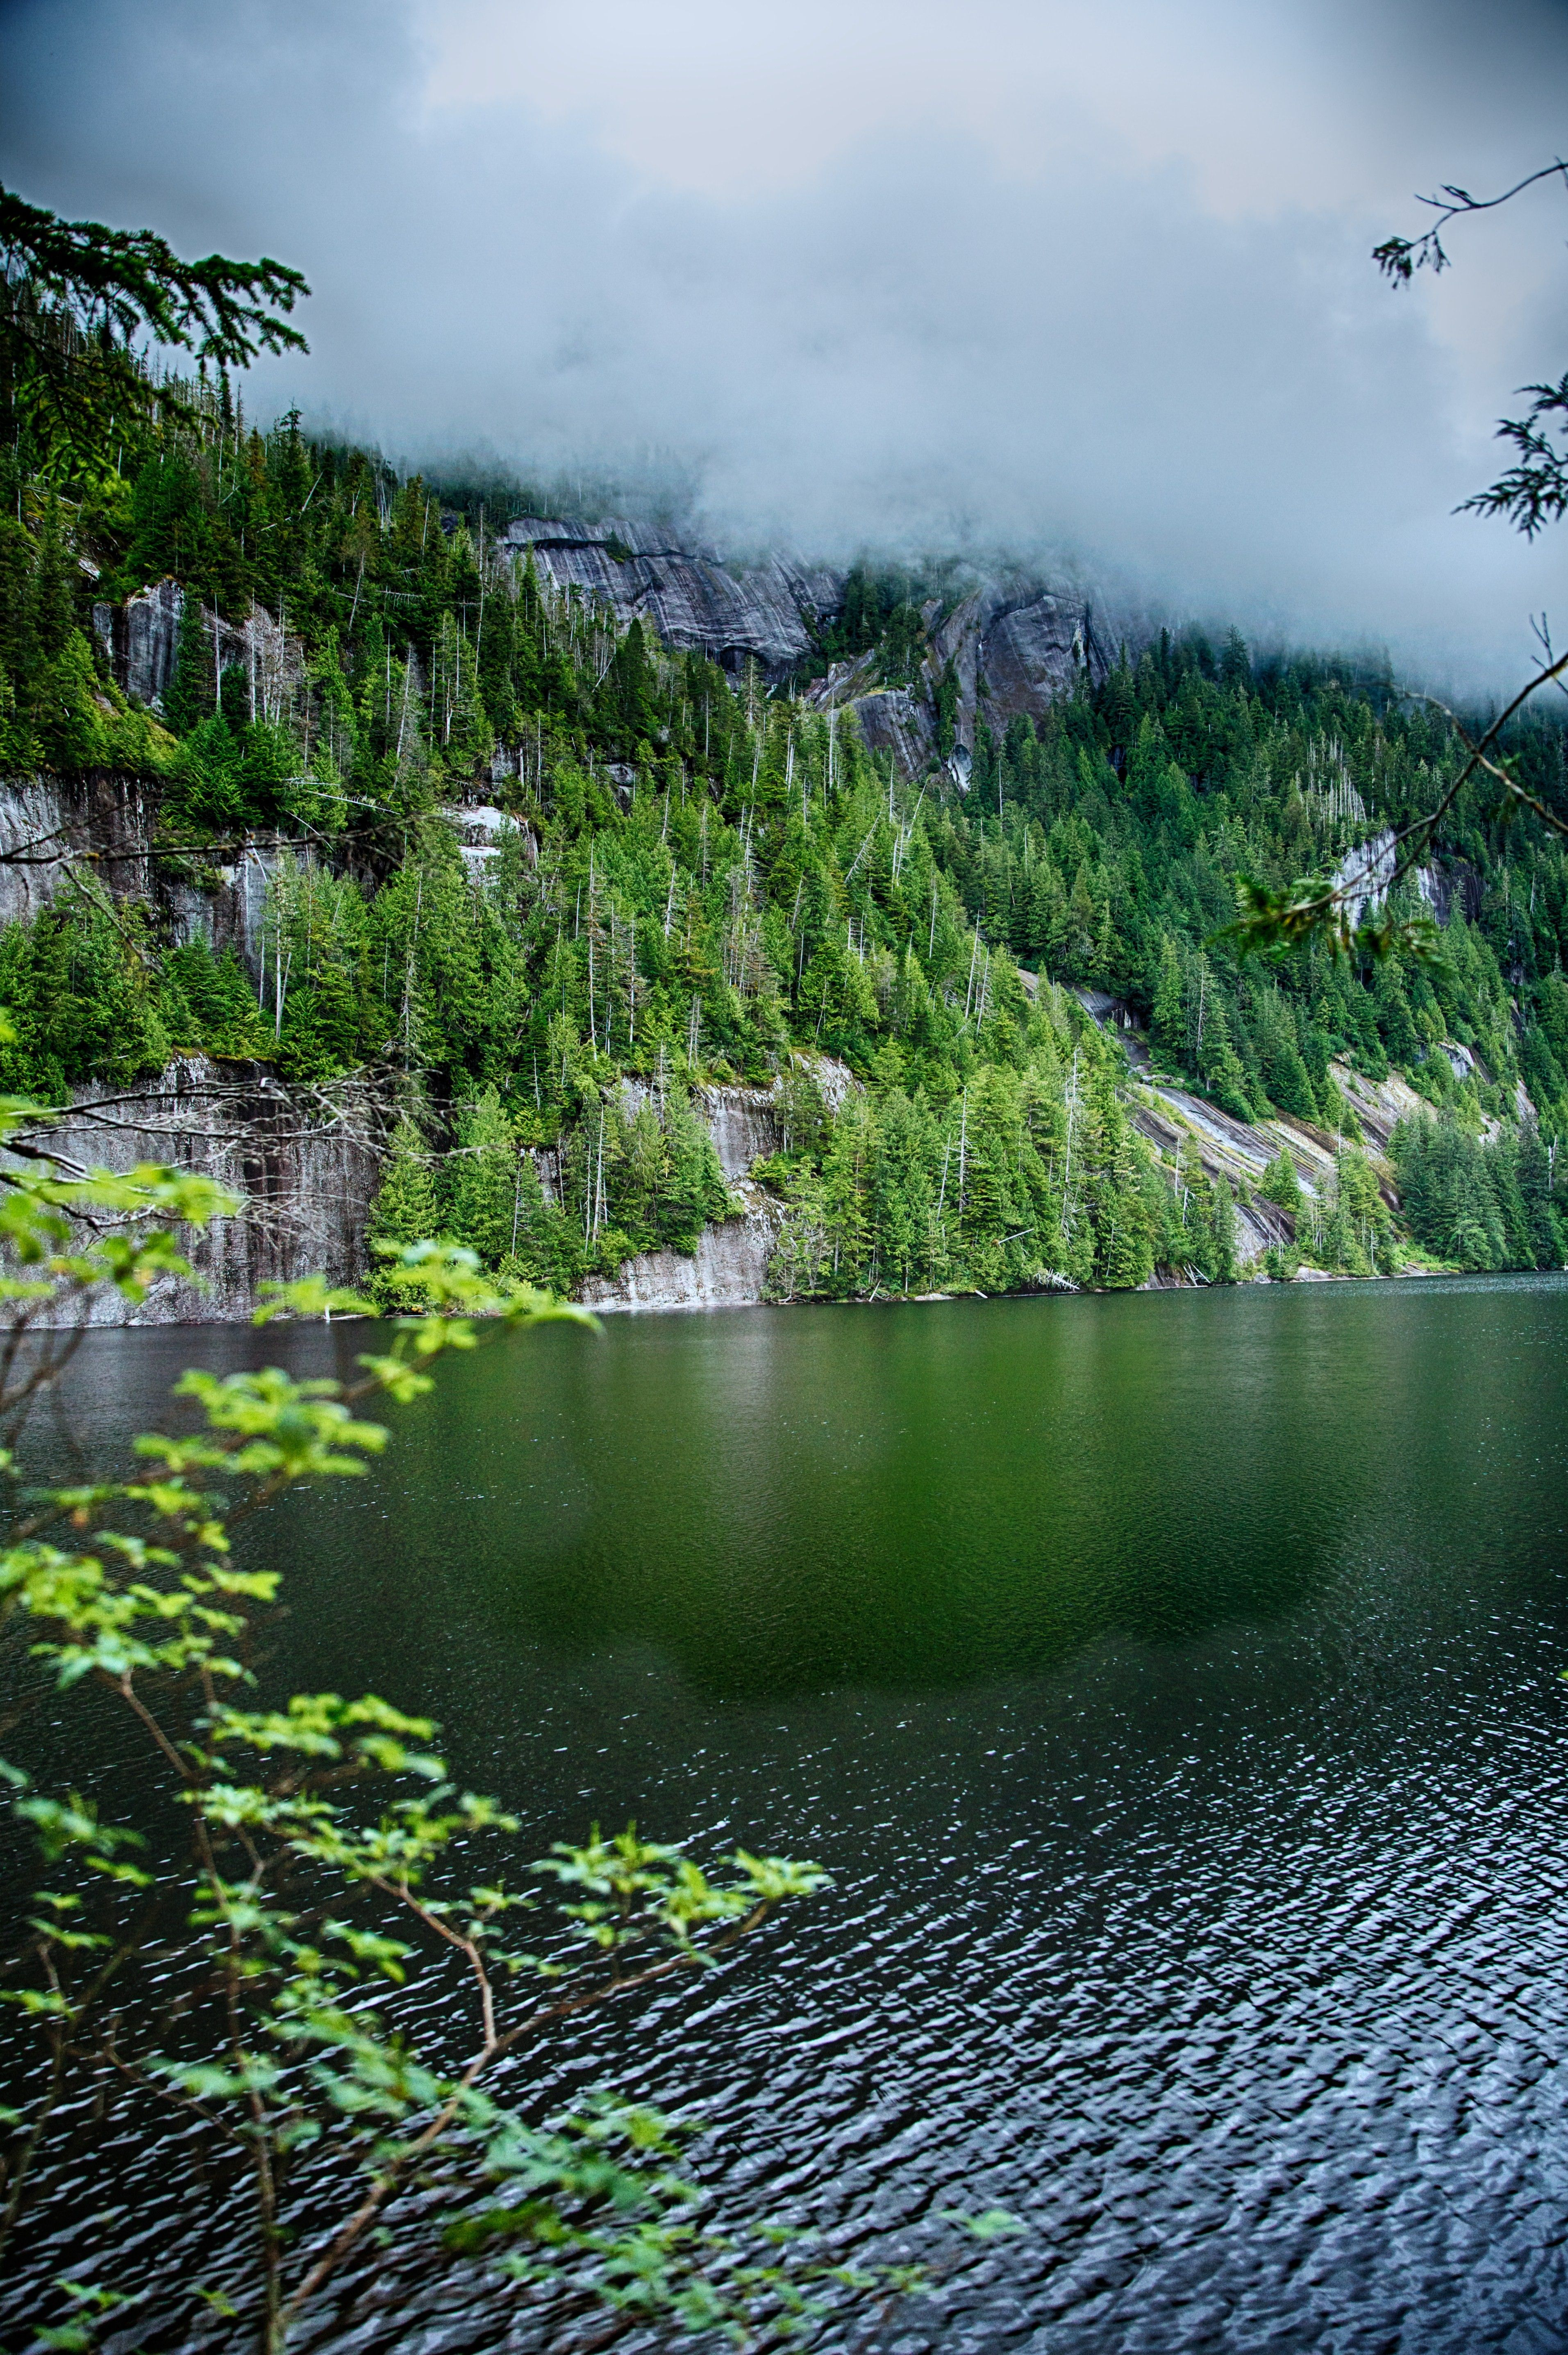 Fog lies low over mountains near a lake in Alaska.